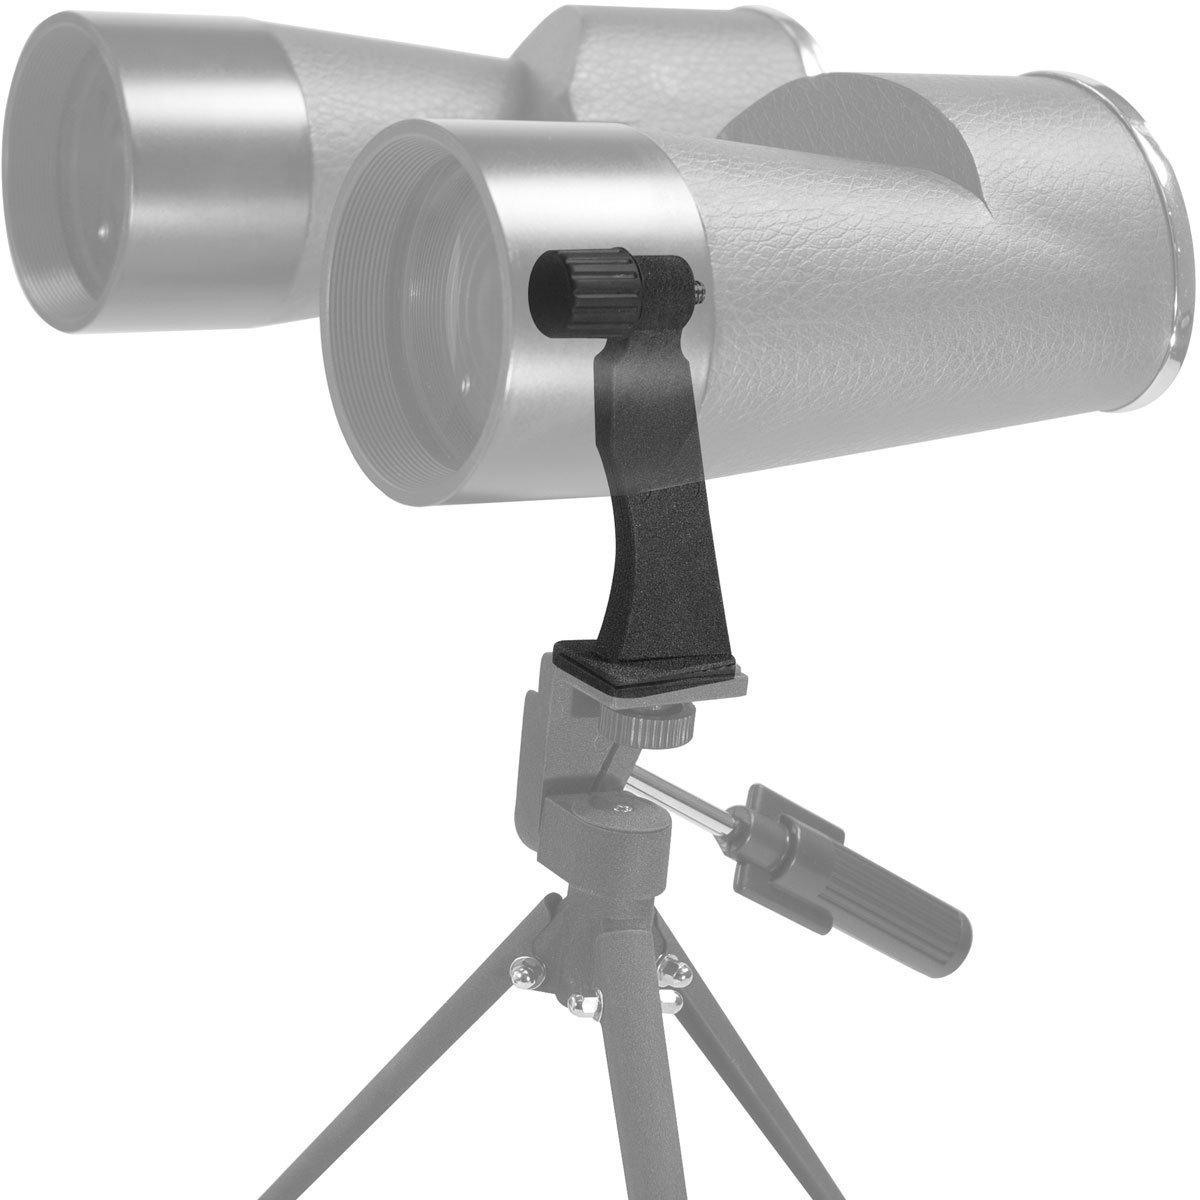 Cameras & Photo Orion 5271 Versatile Tripod Mounting Adapter For Binoculars